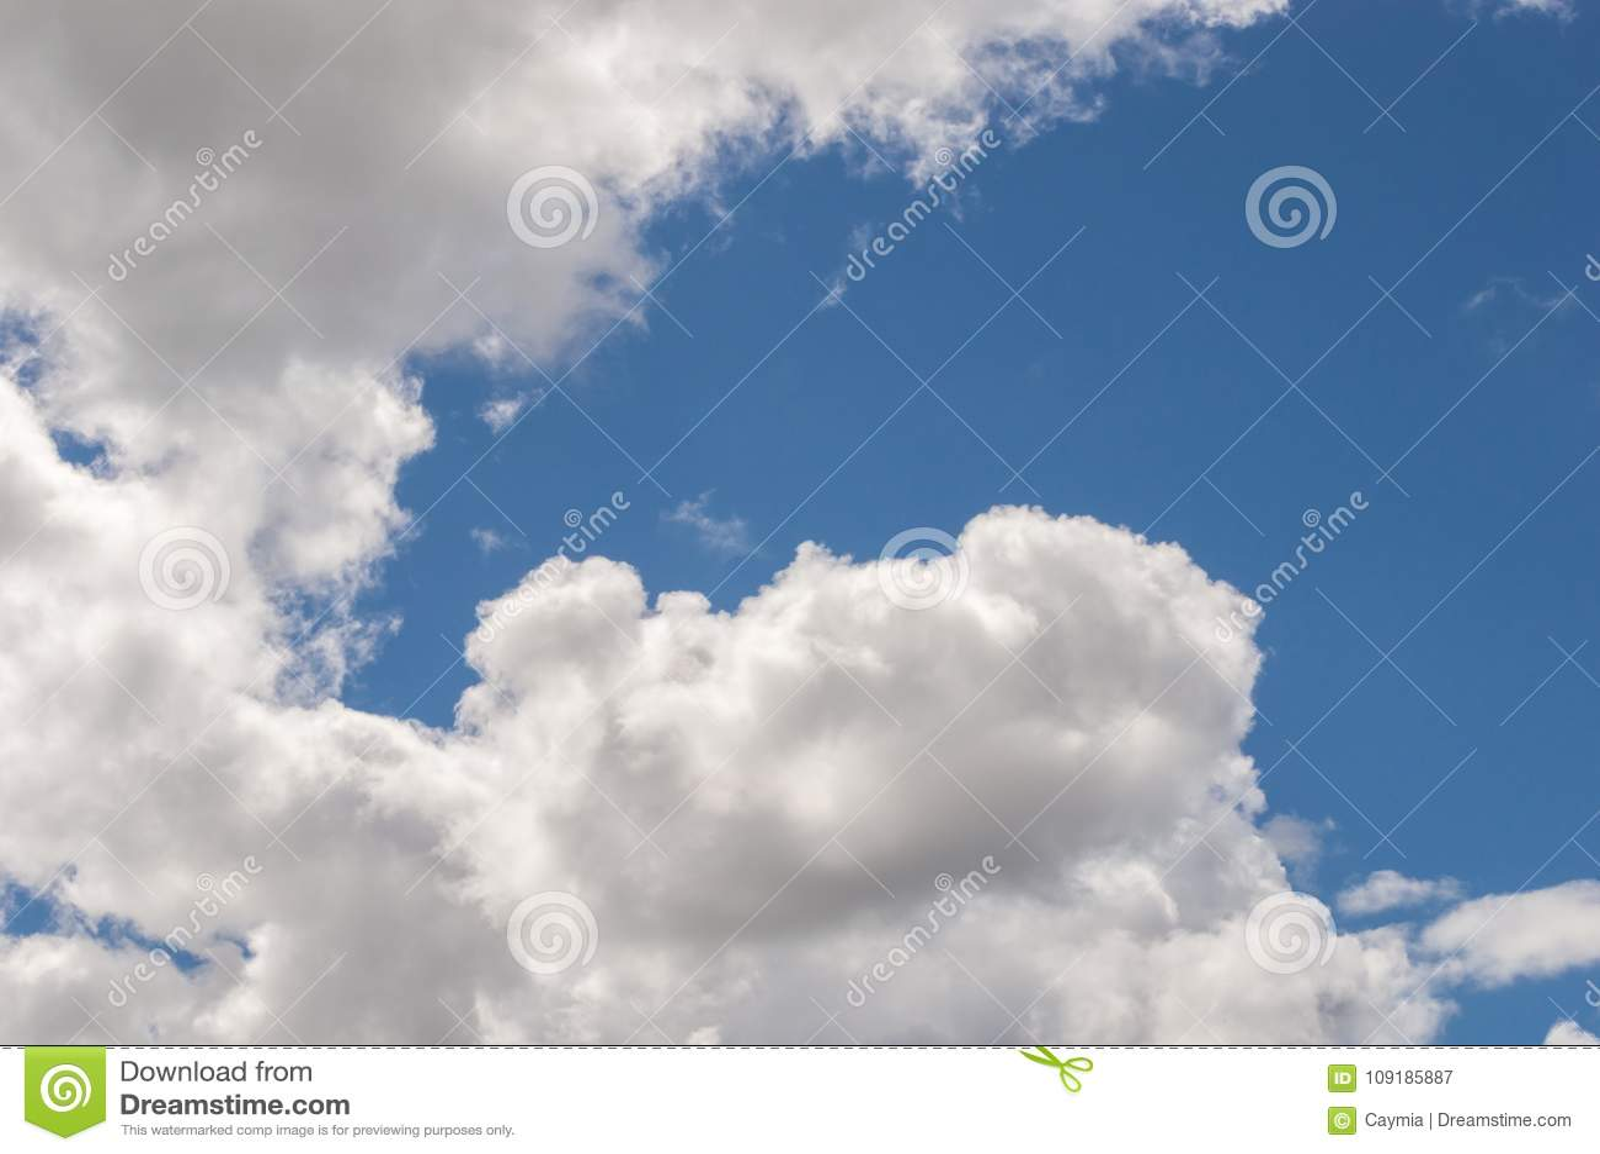 billowy  Fluffy White Billowy Clouds Brightly Back Lit, Blue Sky. Stock Image ...